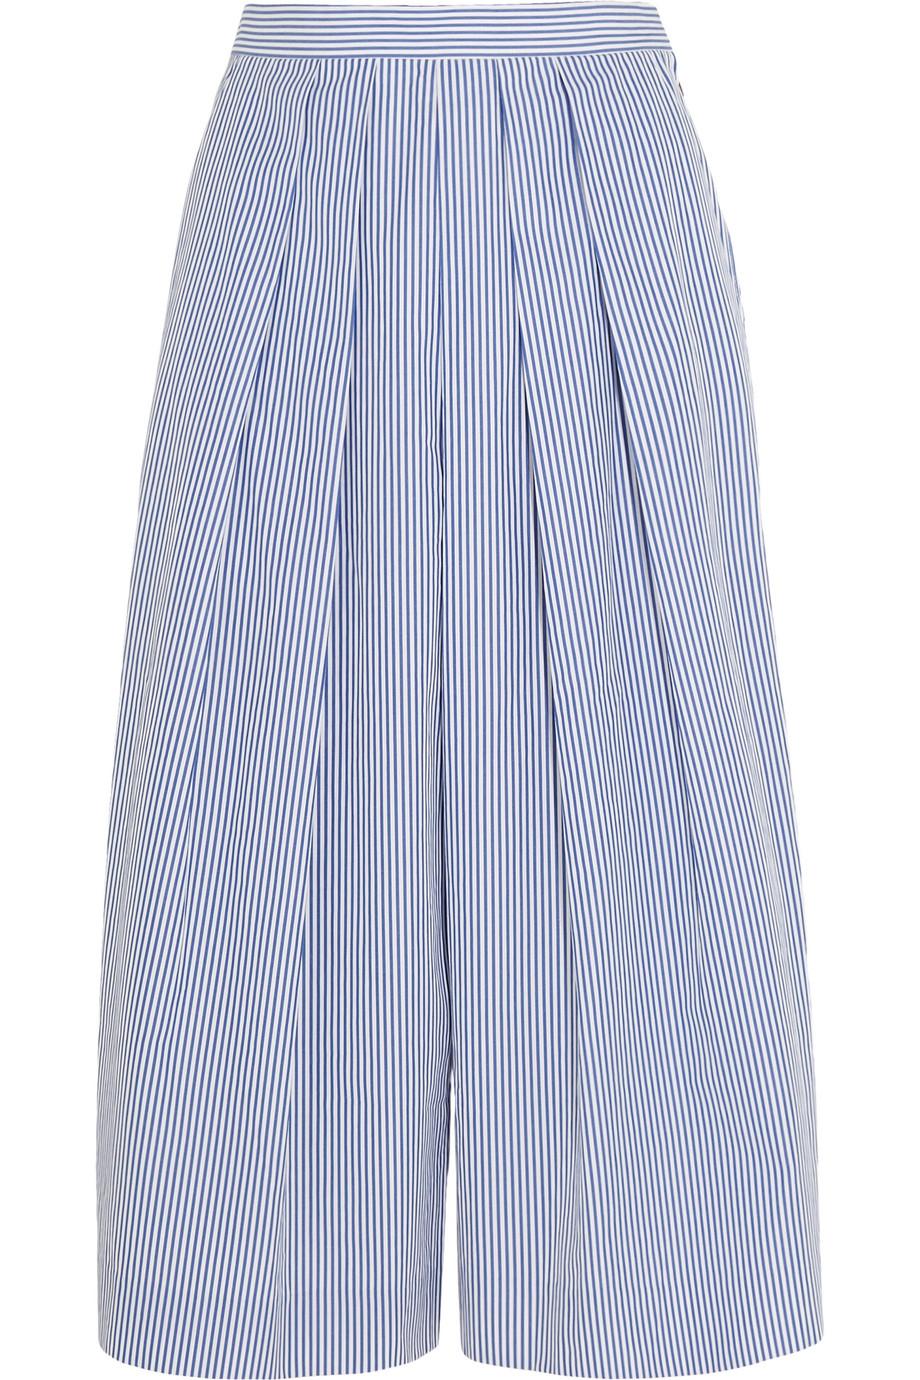 J.Crew Striped Cotton-Poplin Culottes, Size: 2